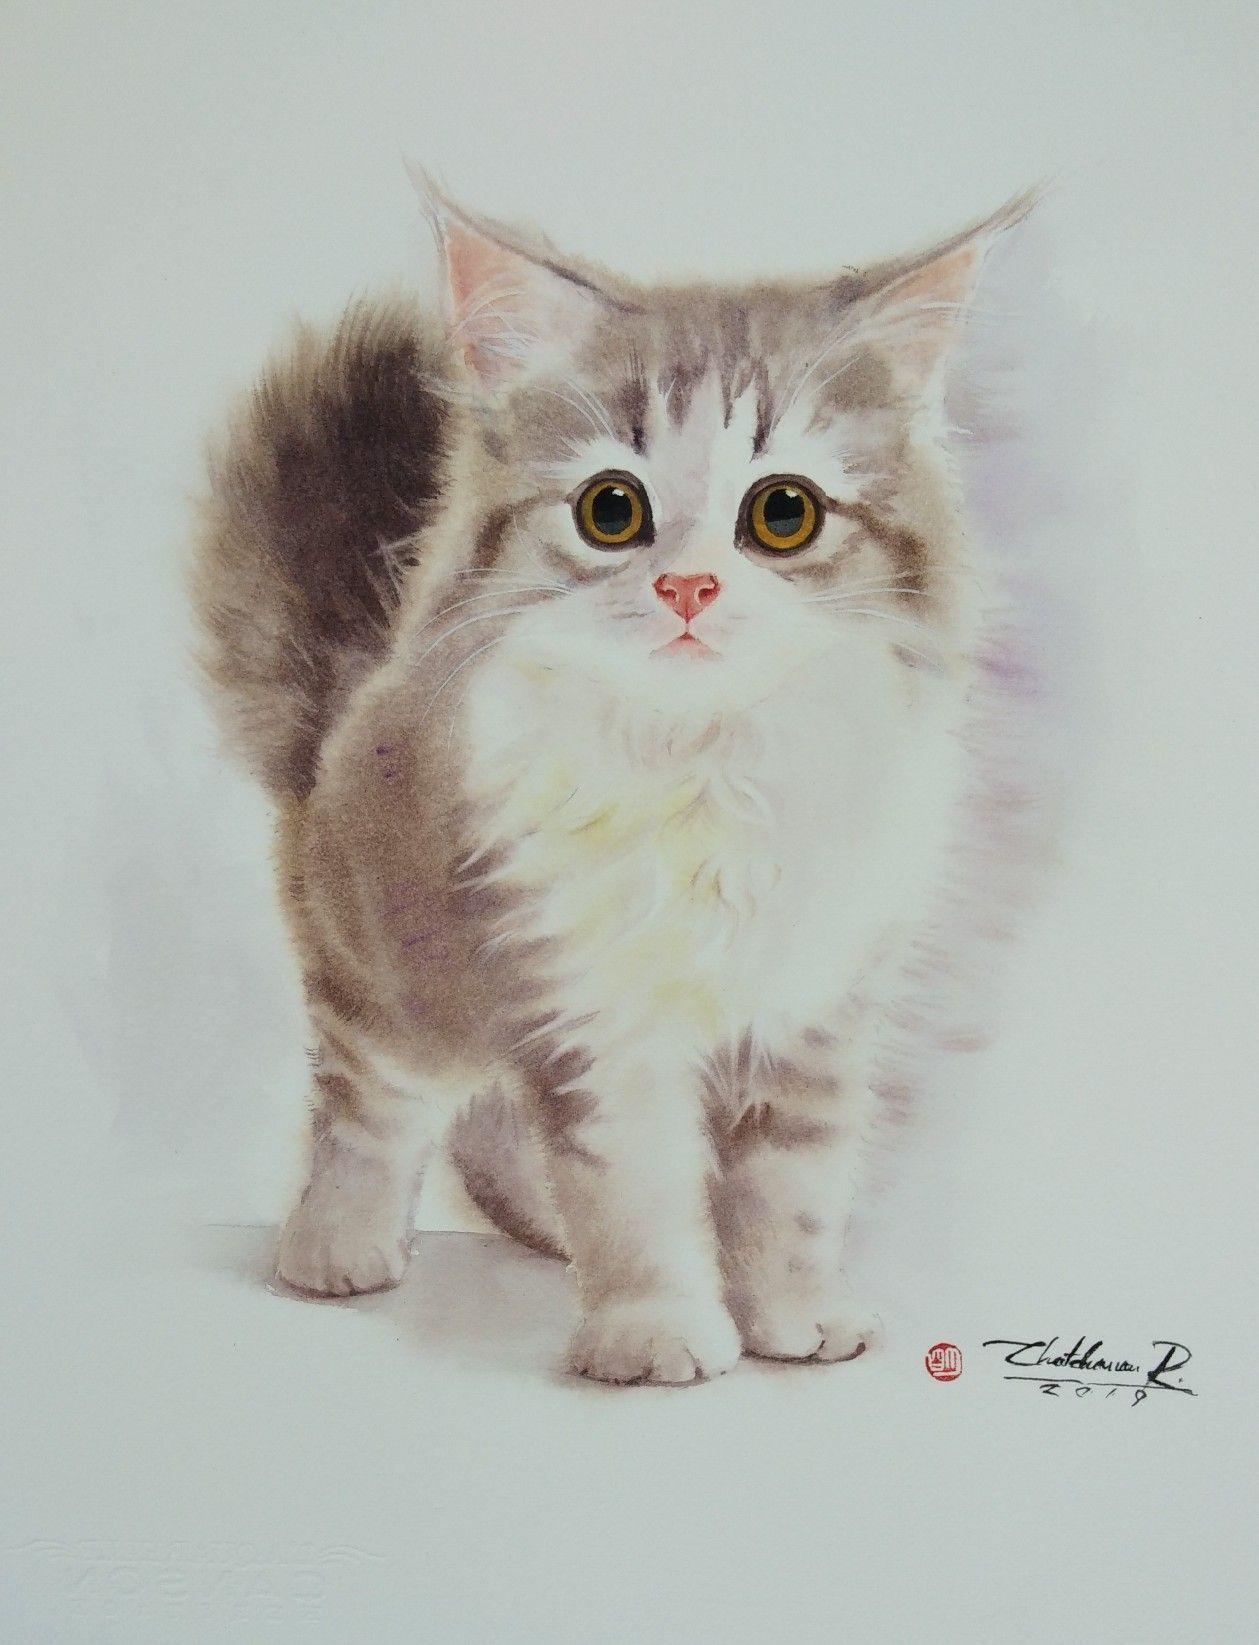 Cat Watercolor Watercolour In 2020 Watercolor Cat Cat Art Cat Drawing